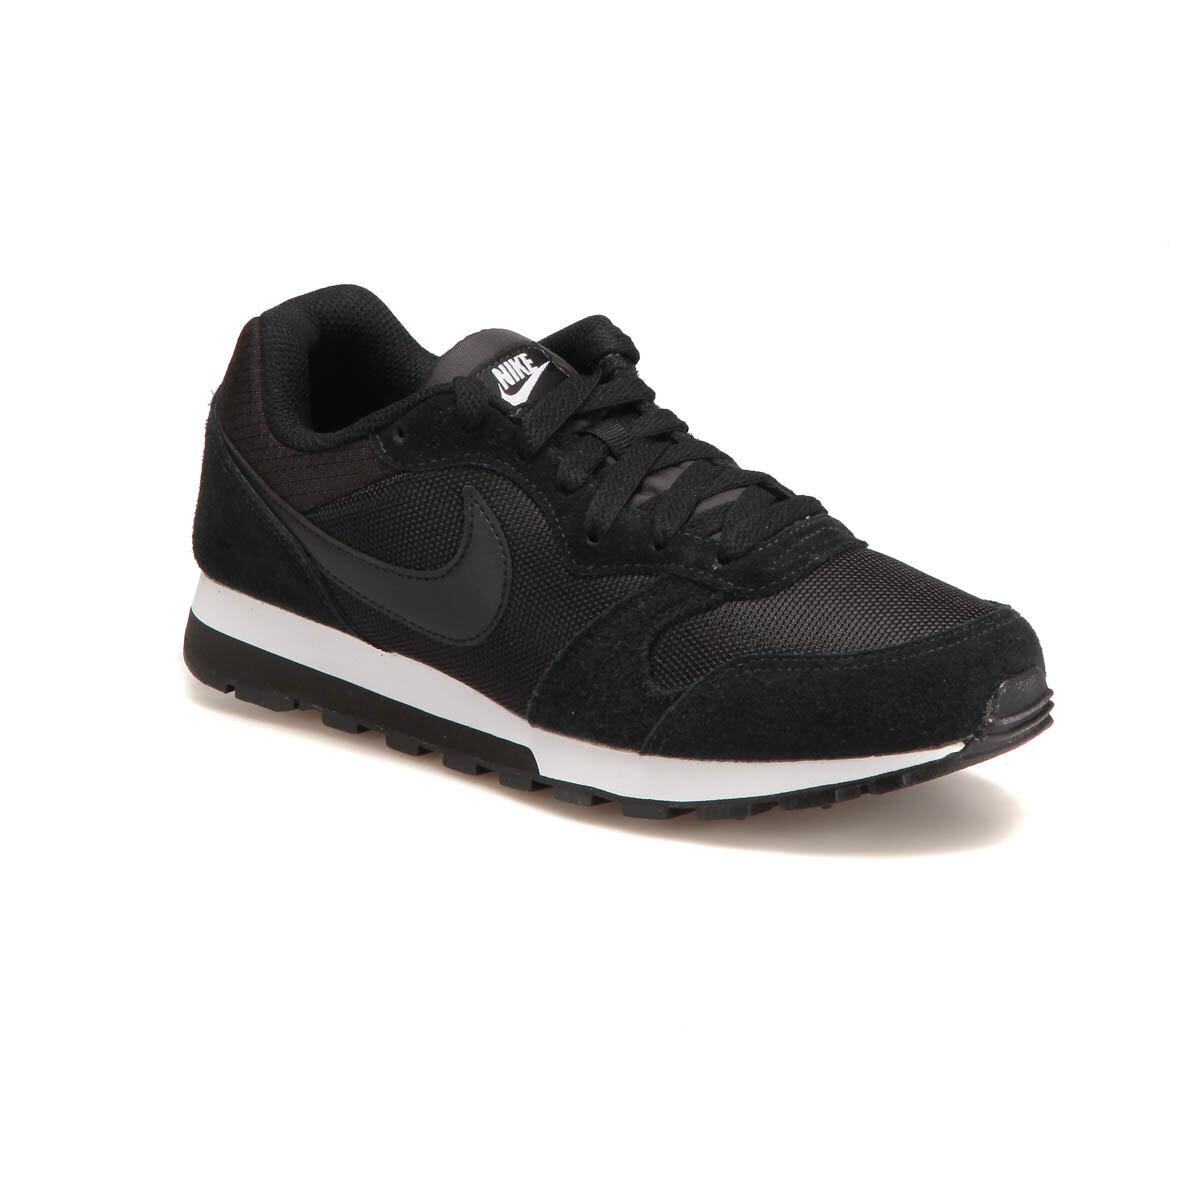 SIYAH Kadın Sneaker Ayakkabı WMNS MD RUNNER 2